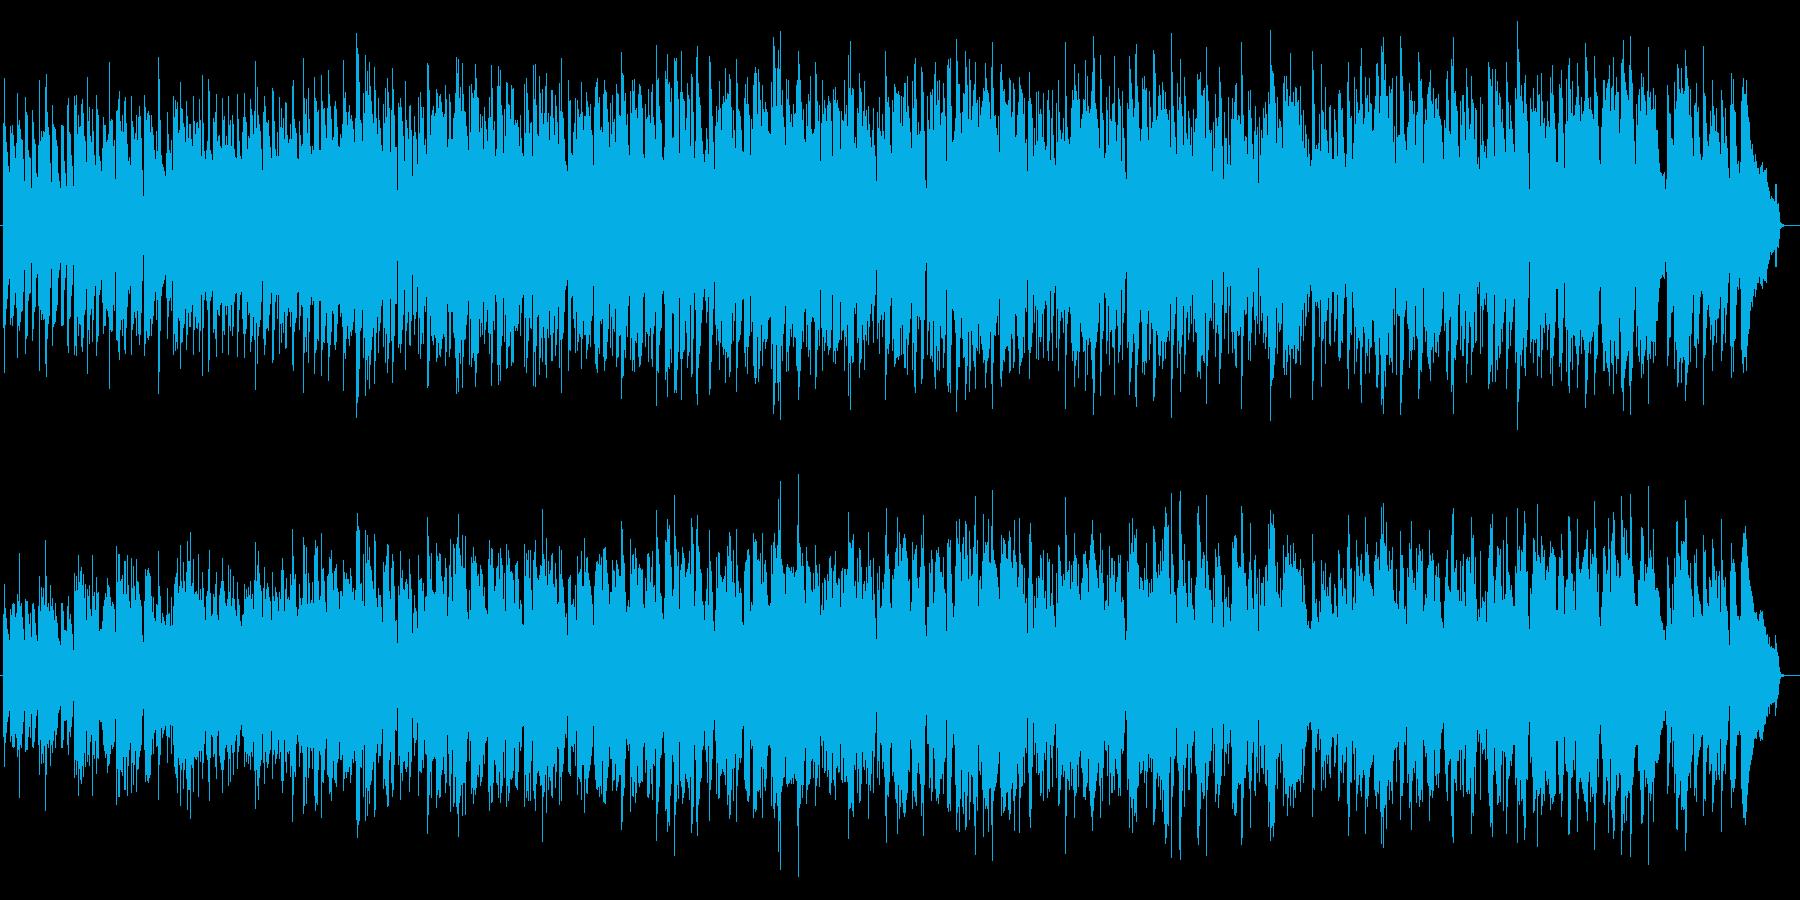 Cappuccinoの再生済みの波形